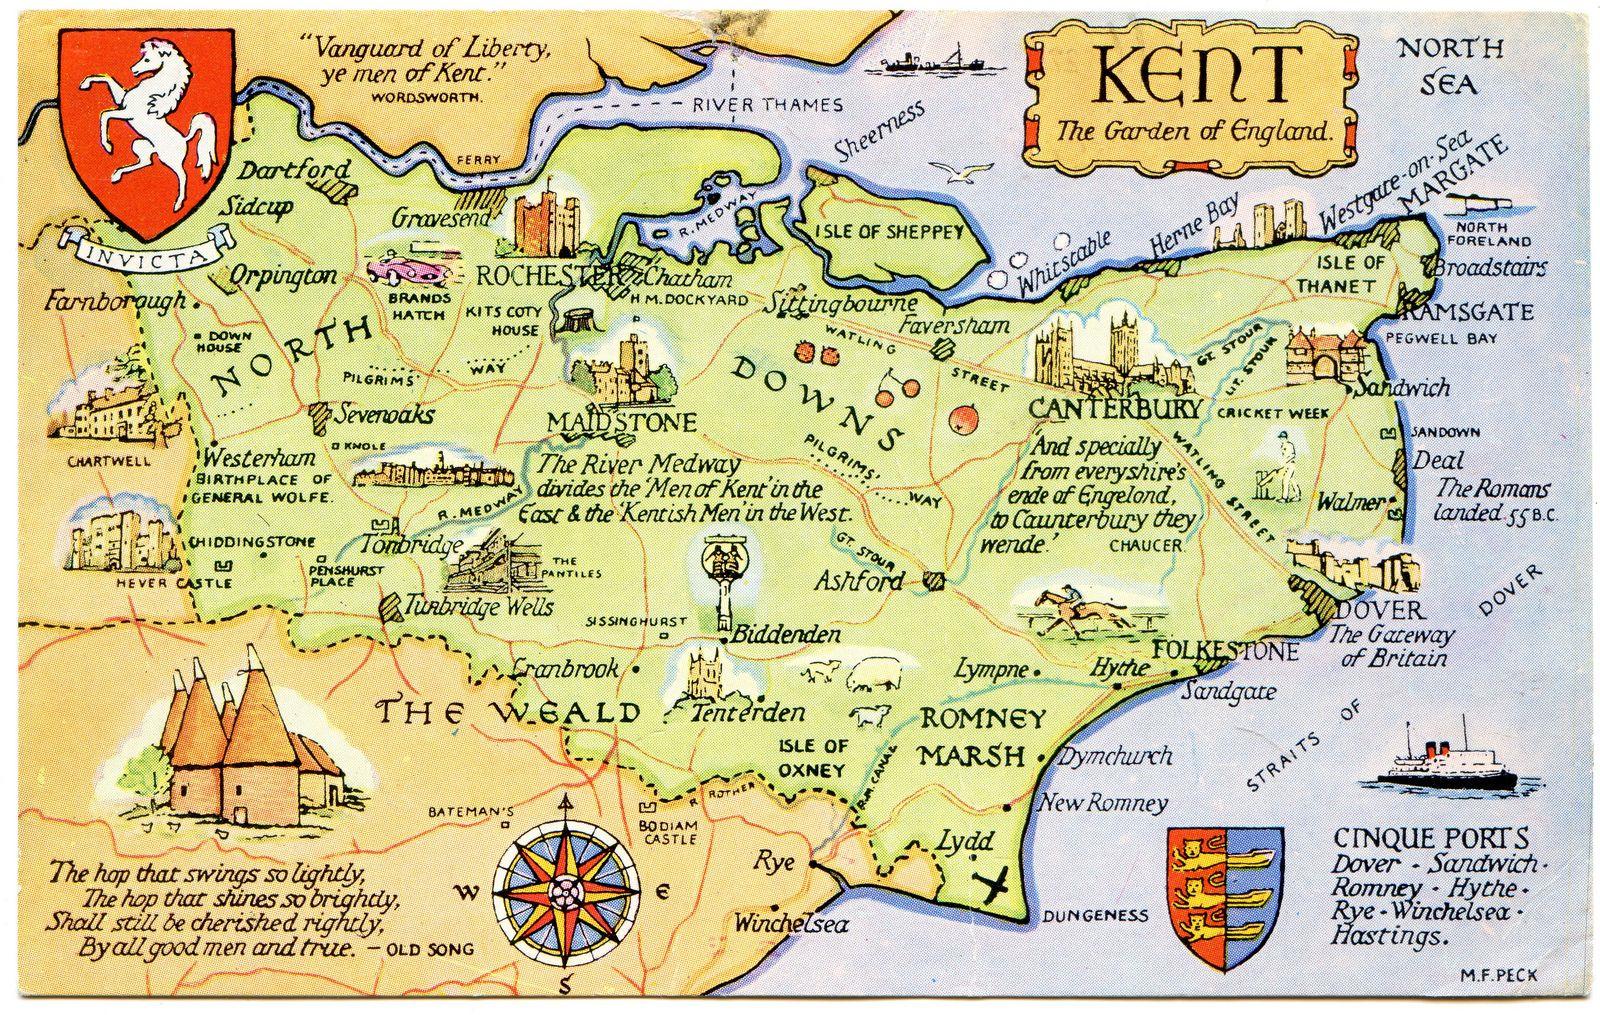 Postcard Map Of Kent The Garden Of England In 2020 Kent England